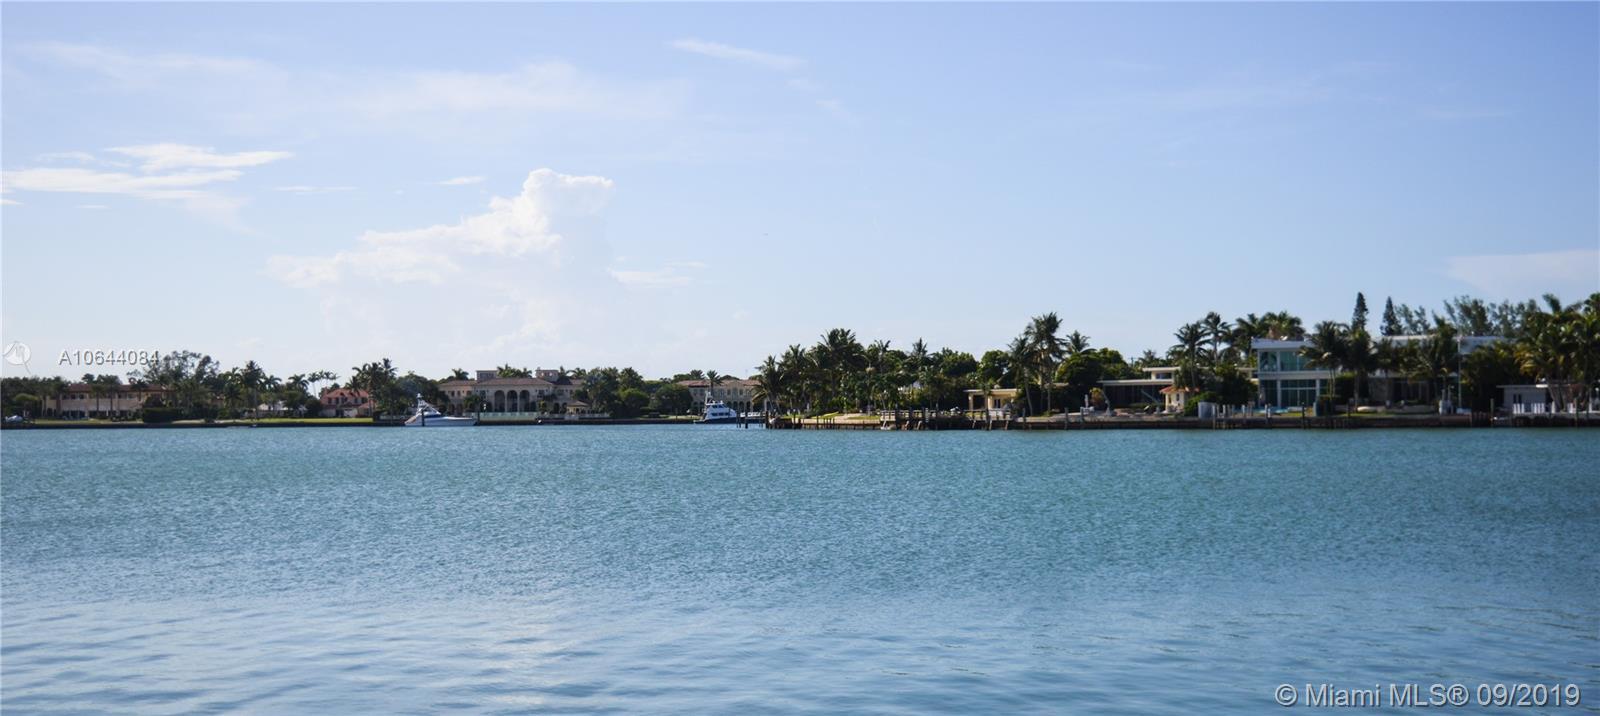 965 Stillwater Dr, Miami Beach, FL 33141 - Miami Beach, FL real estate listing